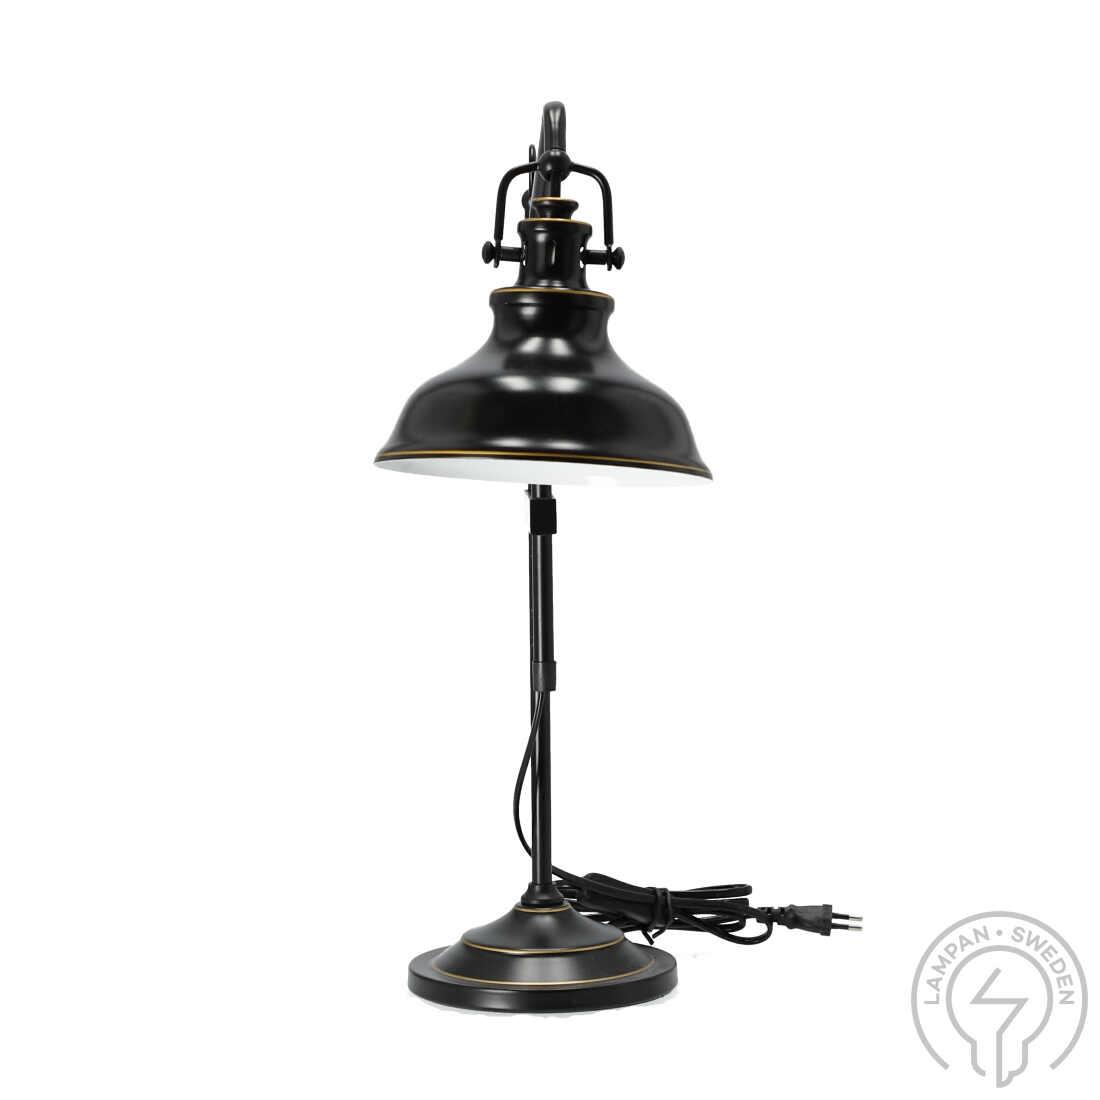 New Haven Antikksvart Bordlampe